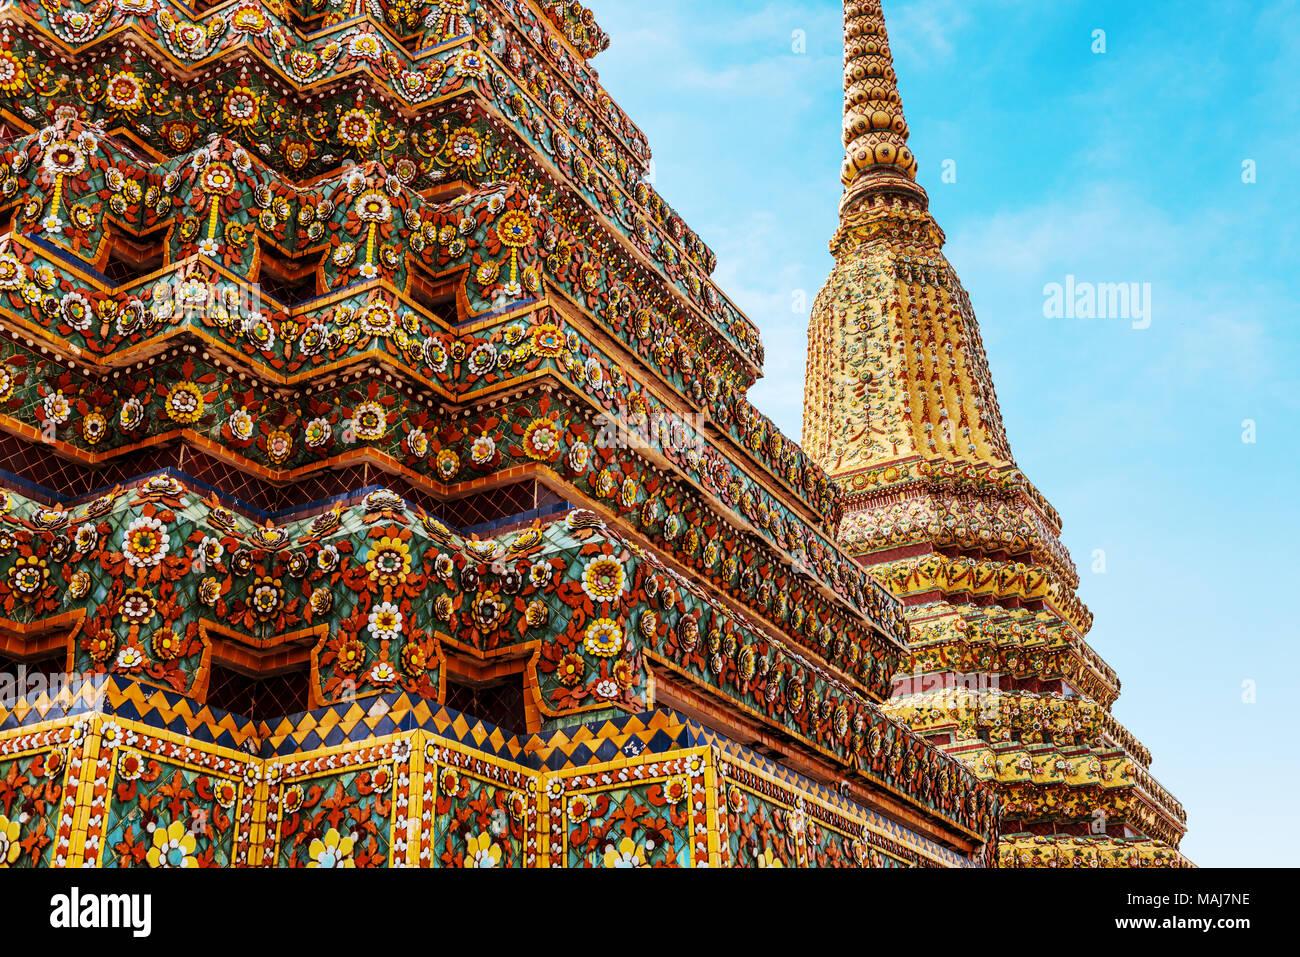 Wat Pho in Bangkok, landmark of Thailand Stock Photo